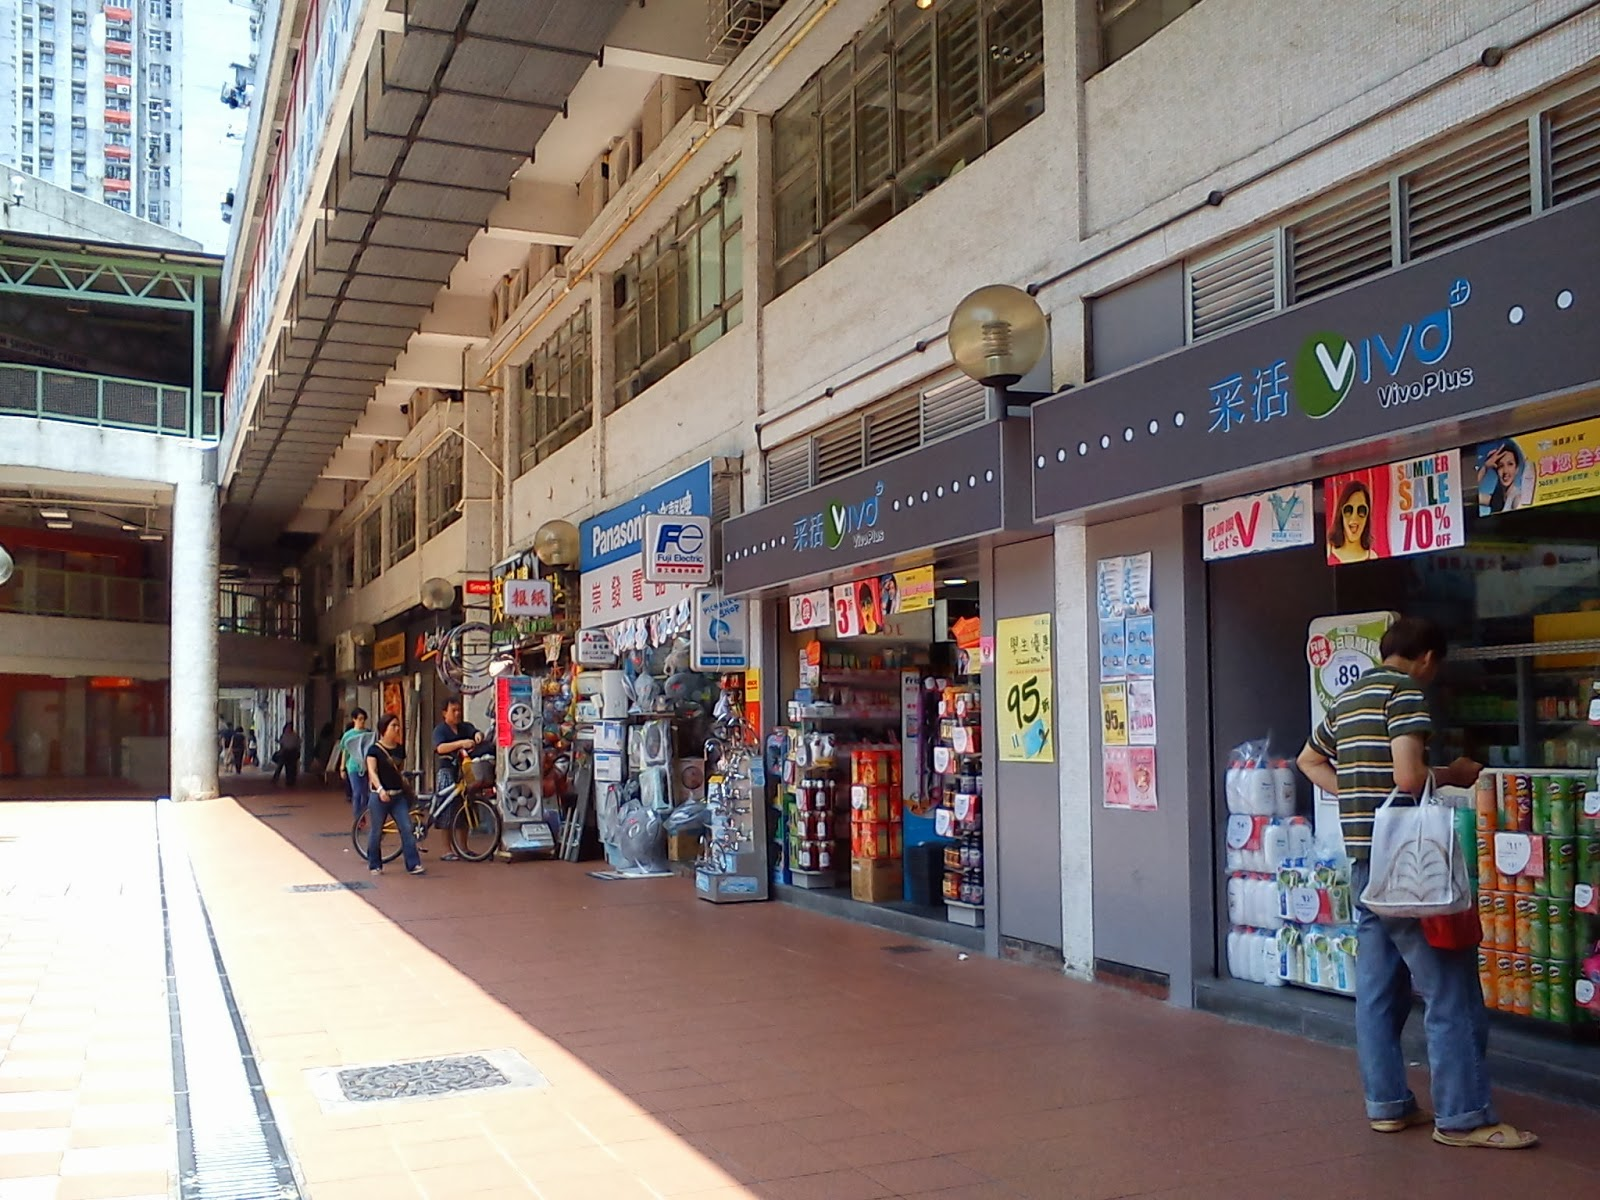 Grassroots O2: [領匯商場] 寶林商場 @2012-06-02